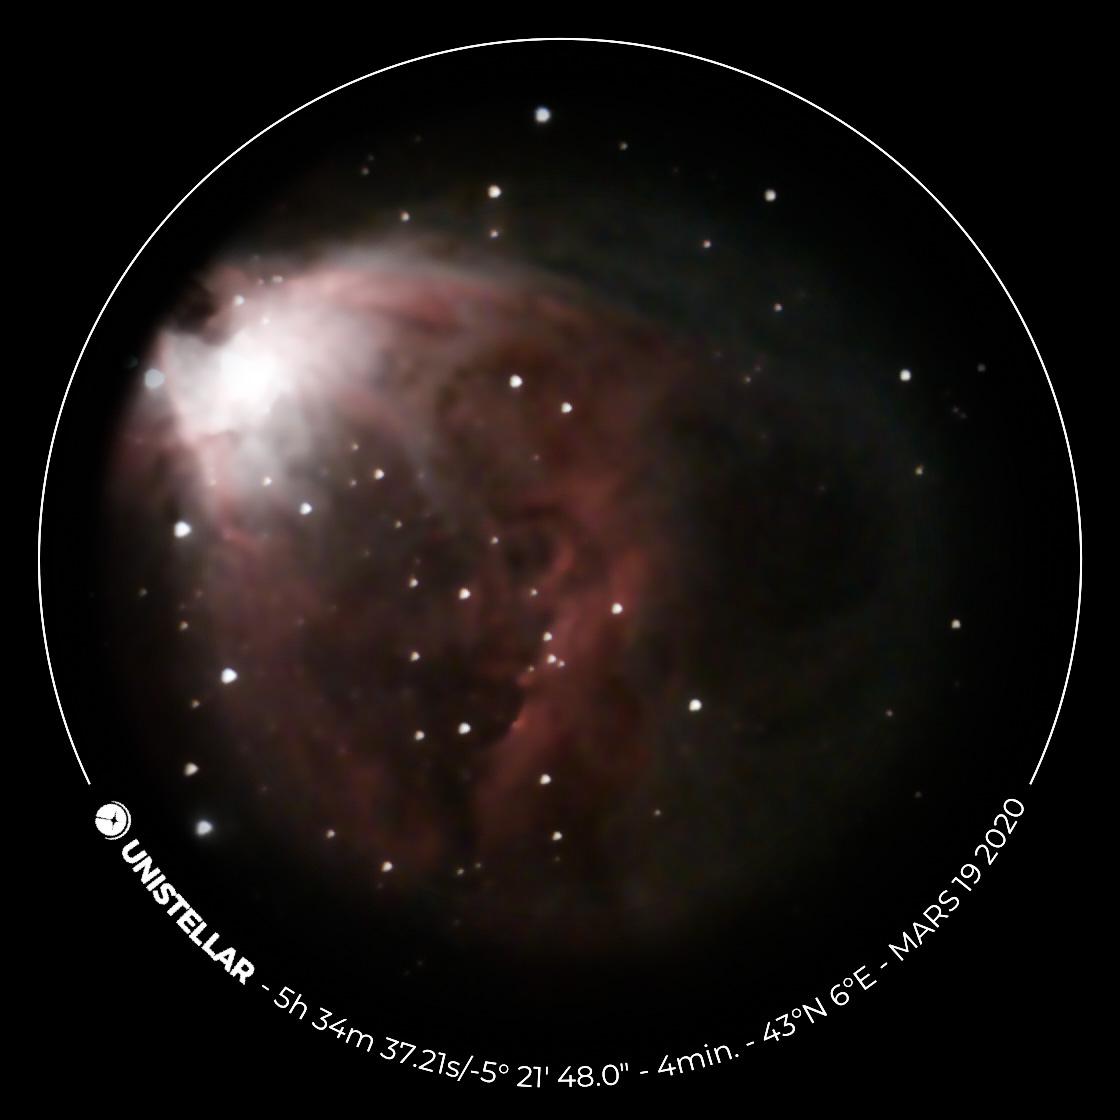 eVscope-20200319-204118.jpg